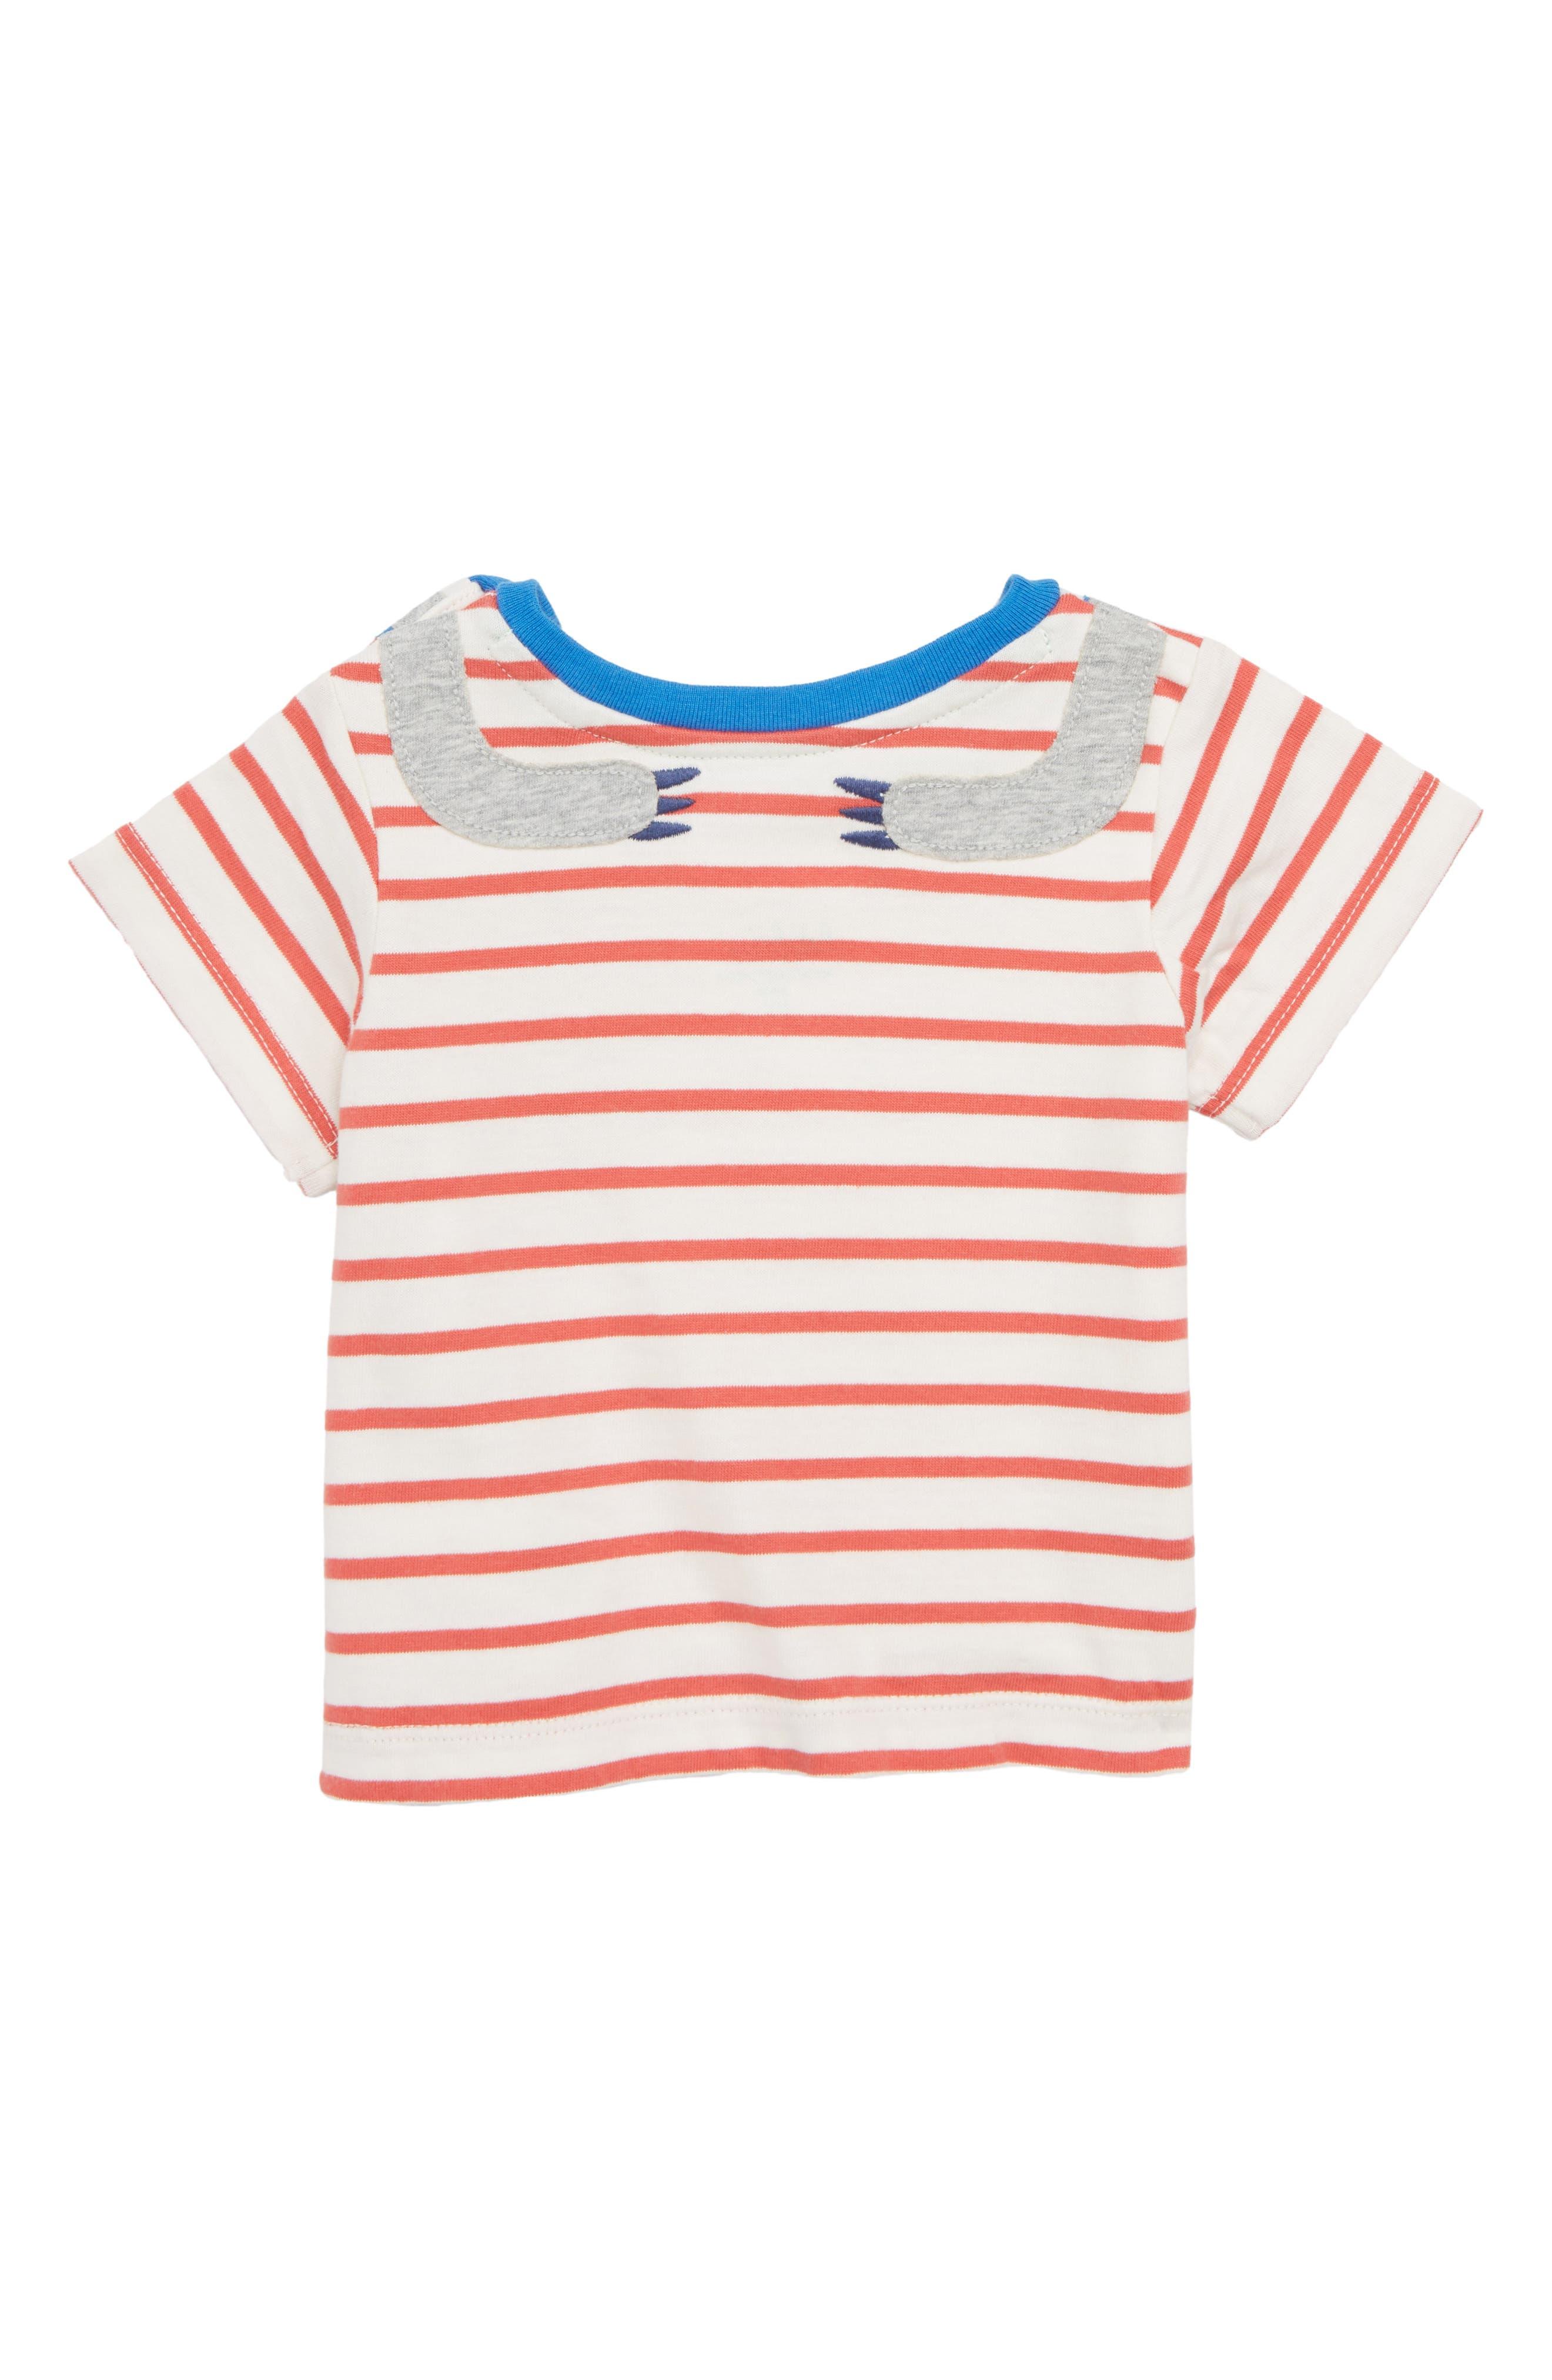 Sloth Appliqué T-Shirt,                             Alternate thumbnail 2, color,                             Crayon Red